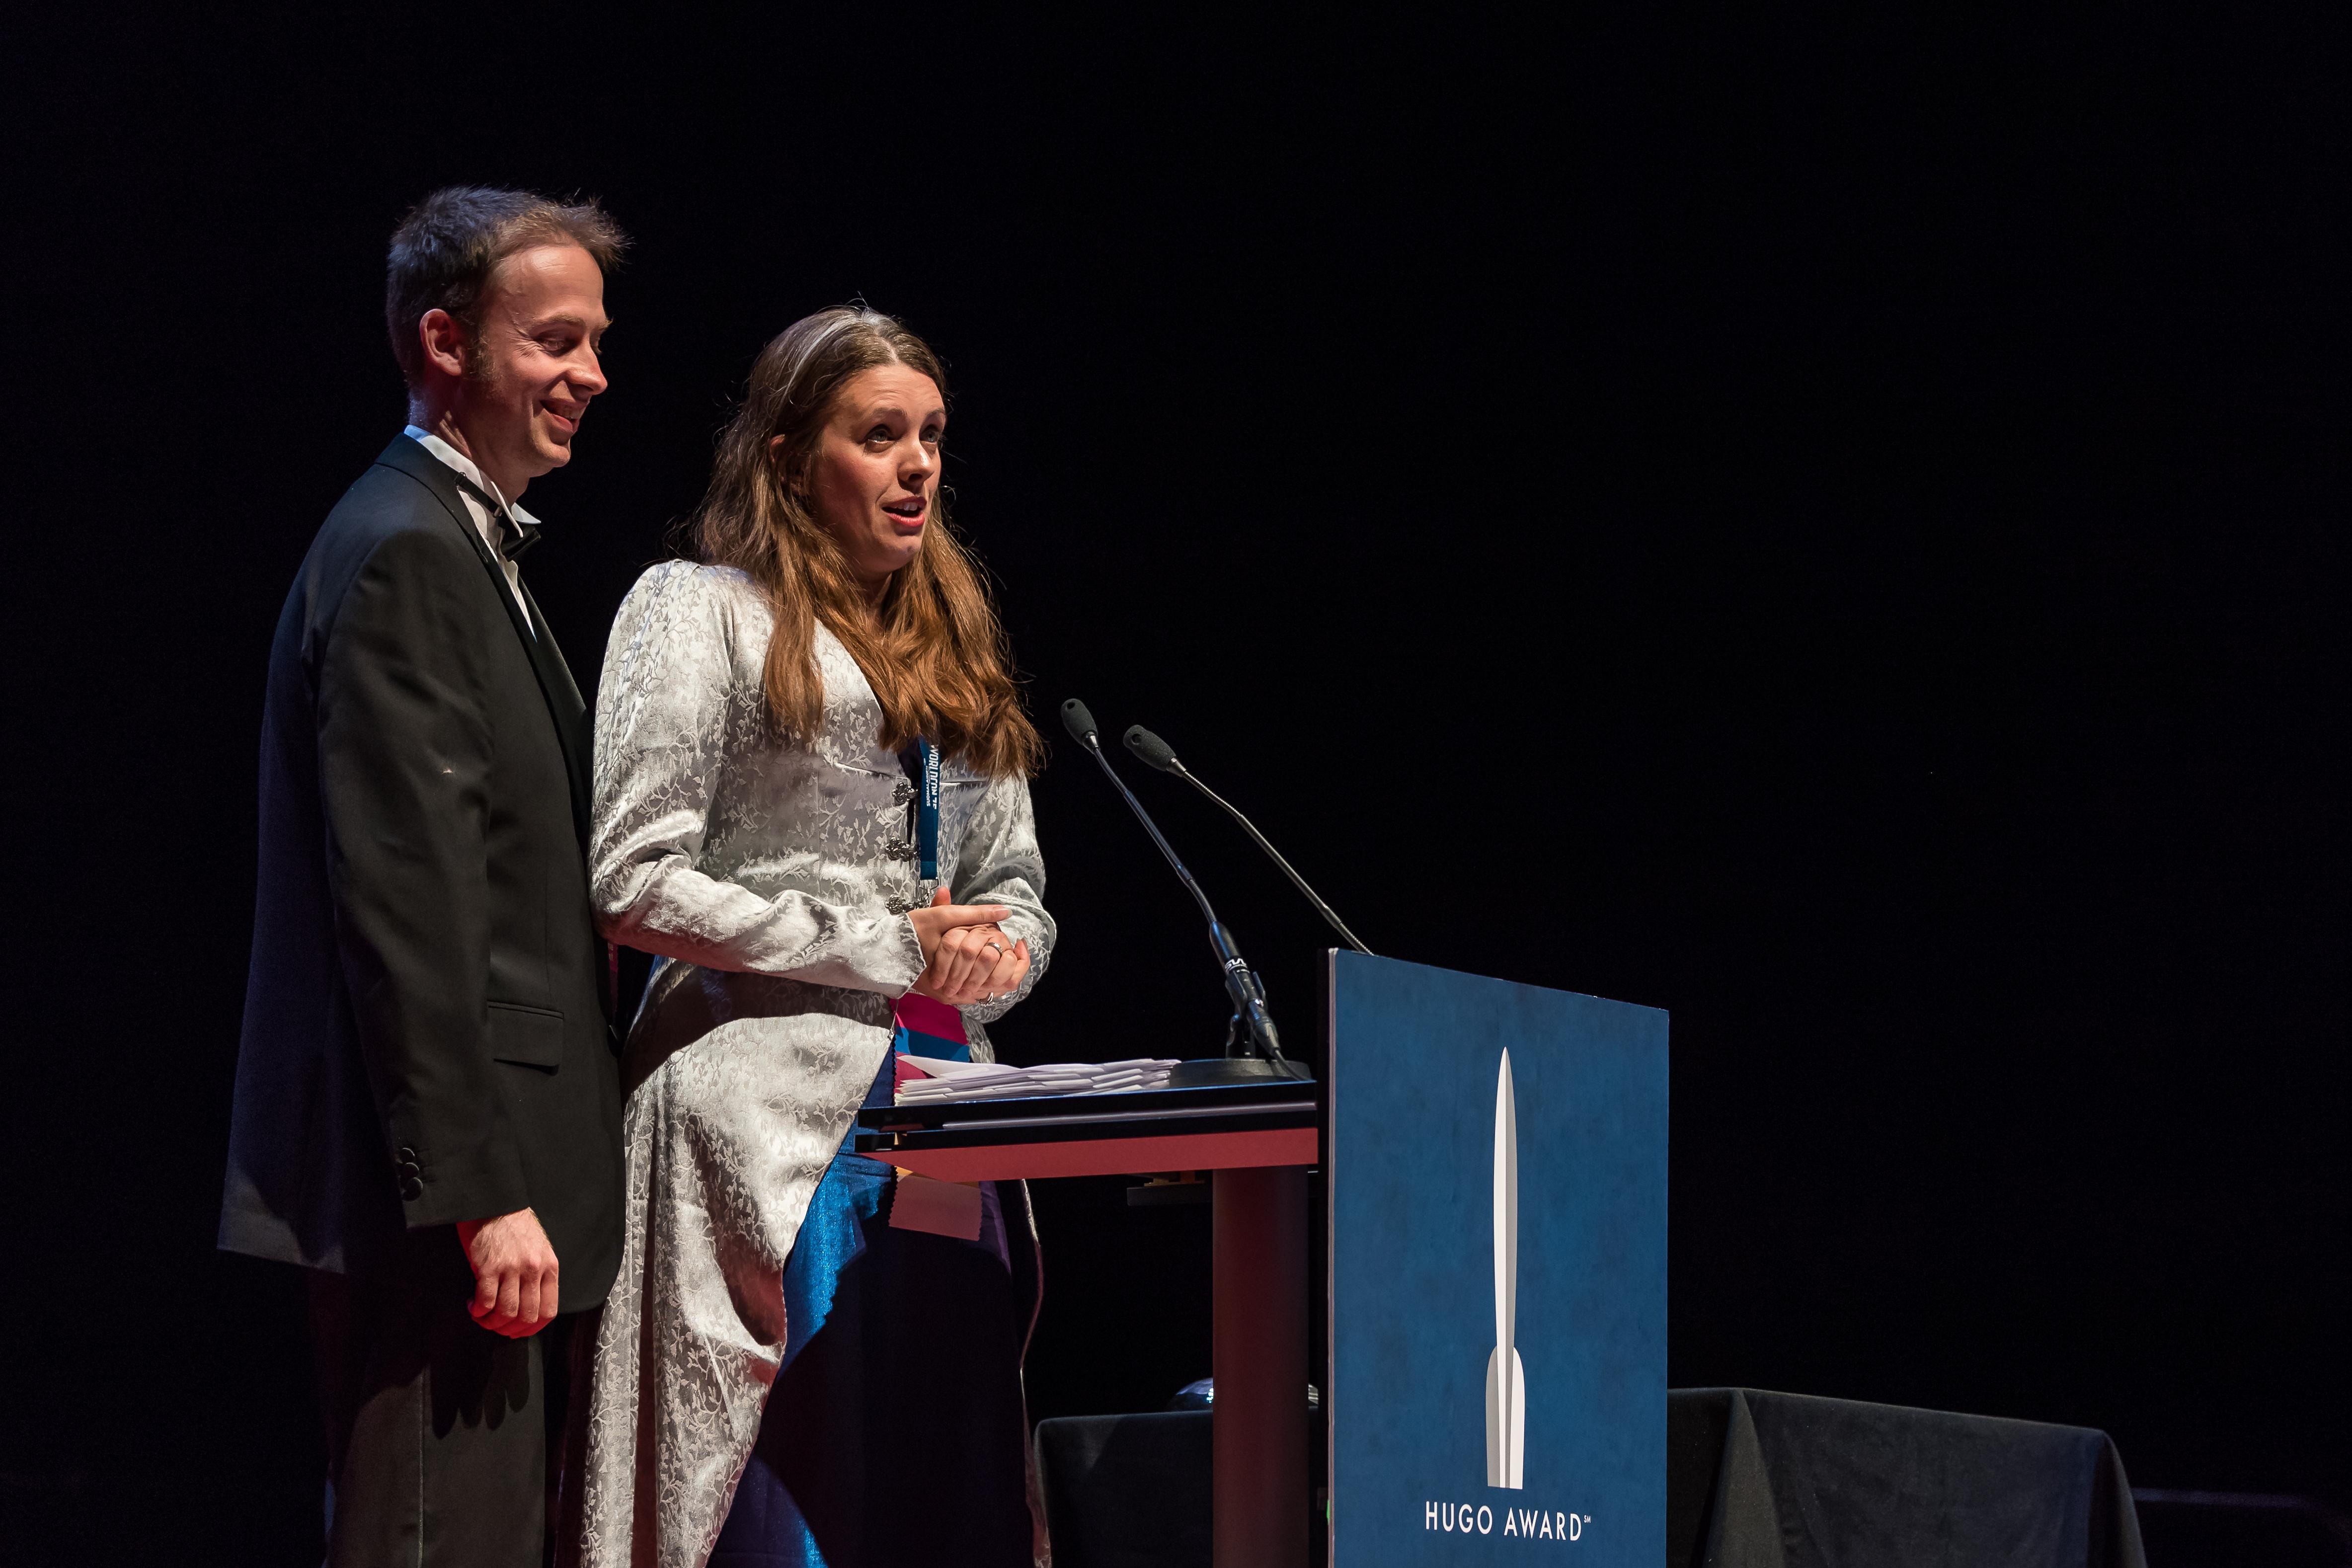 Hugo Award for Best Fancast - Wikipedia